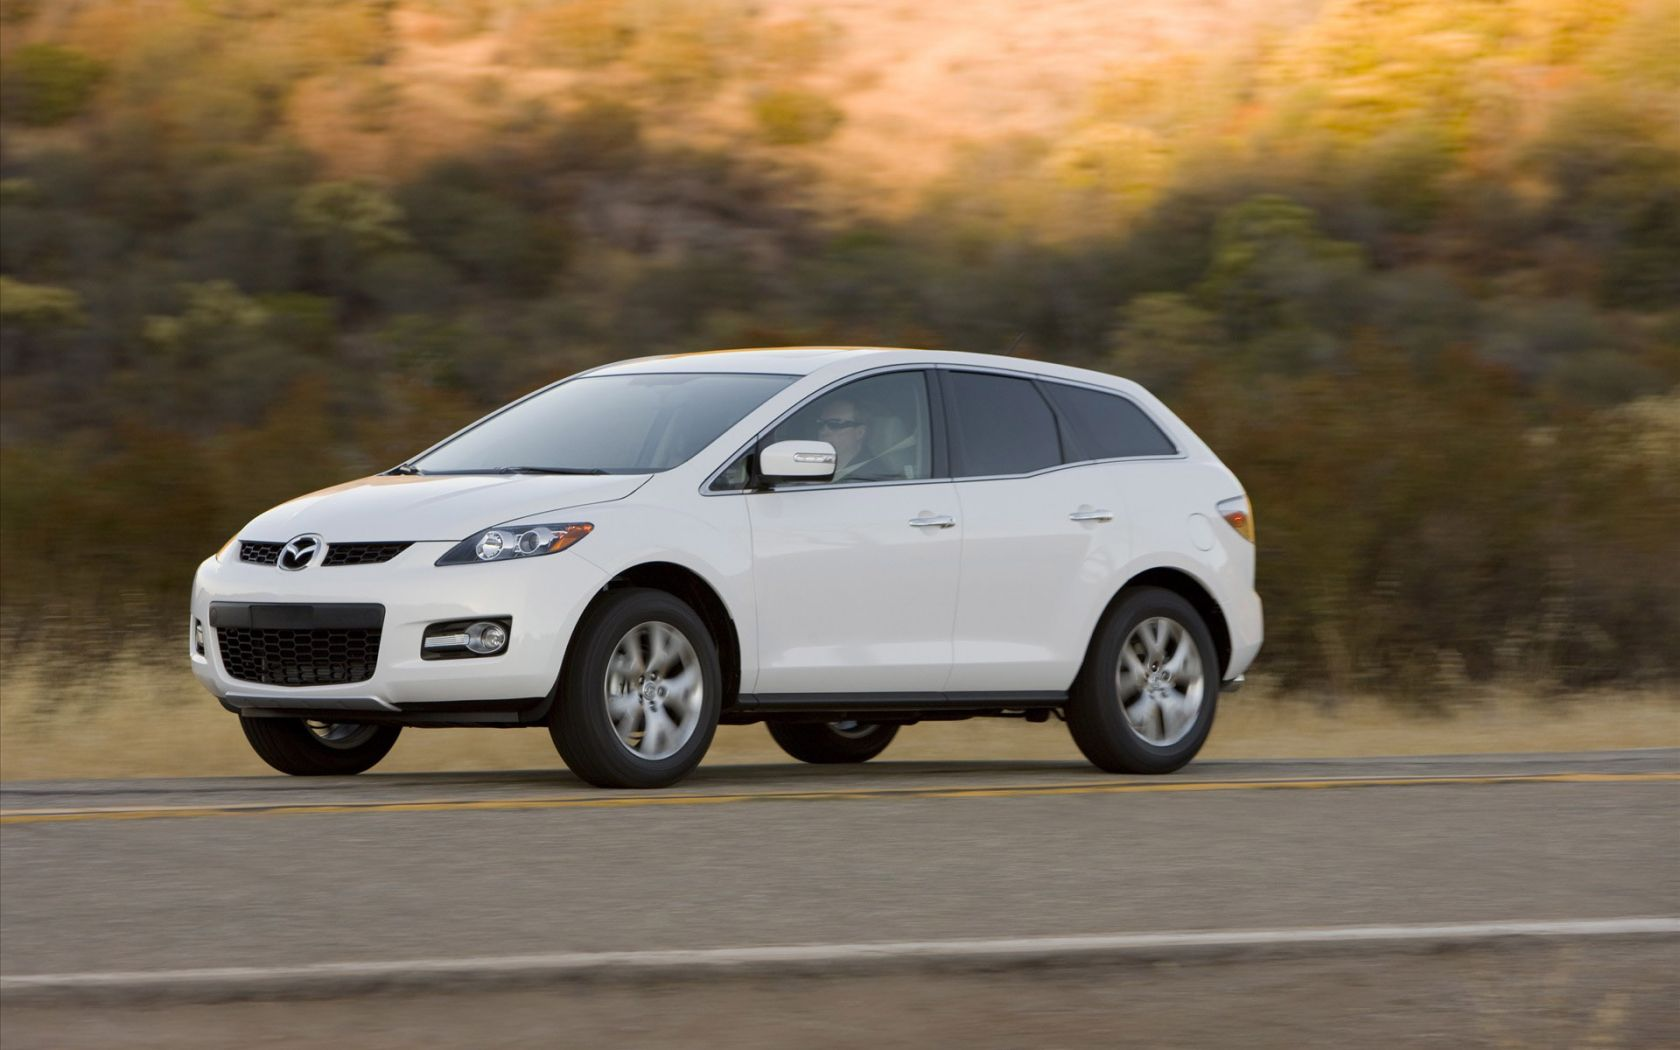 Mazda Cx7 White Side View Moving Wallpaper 1680x1050